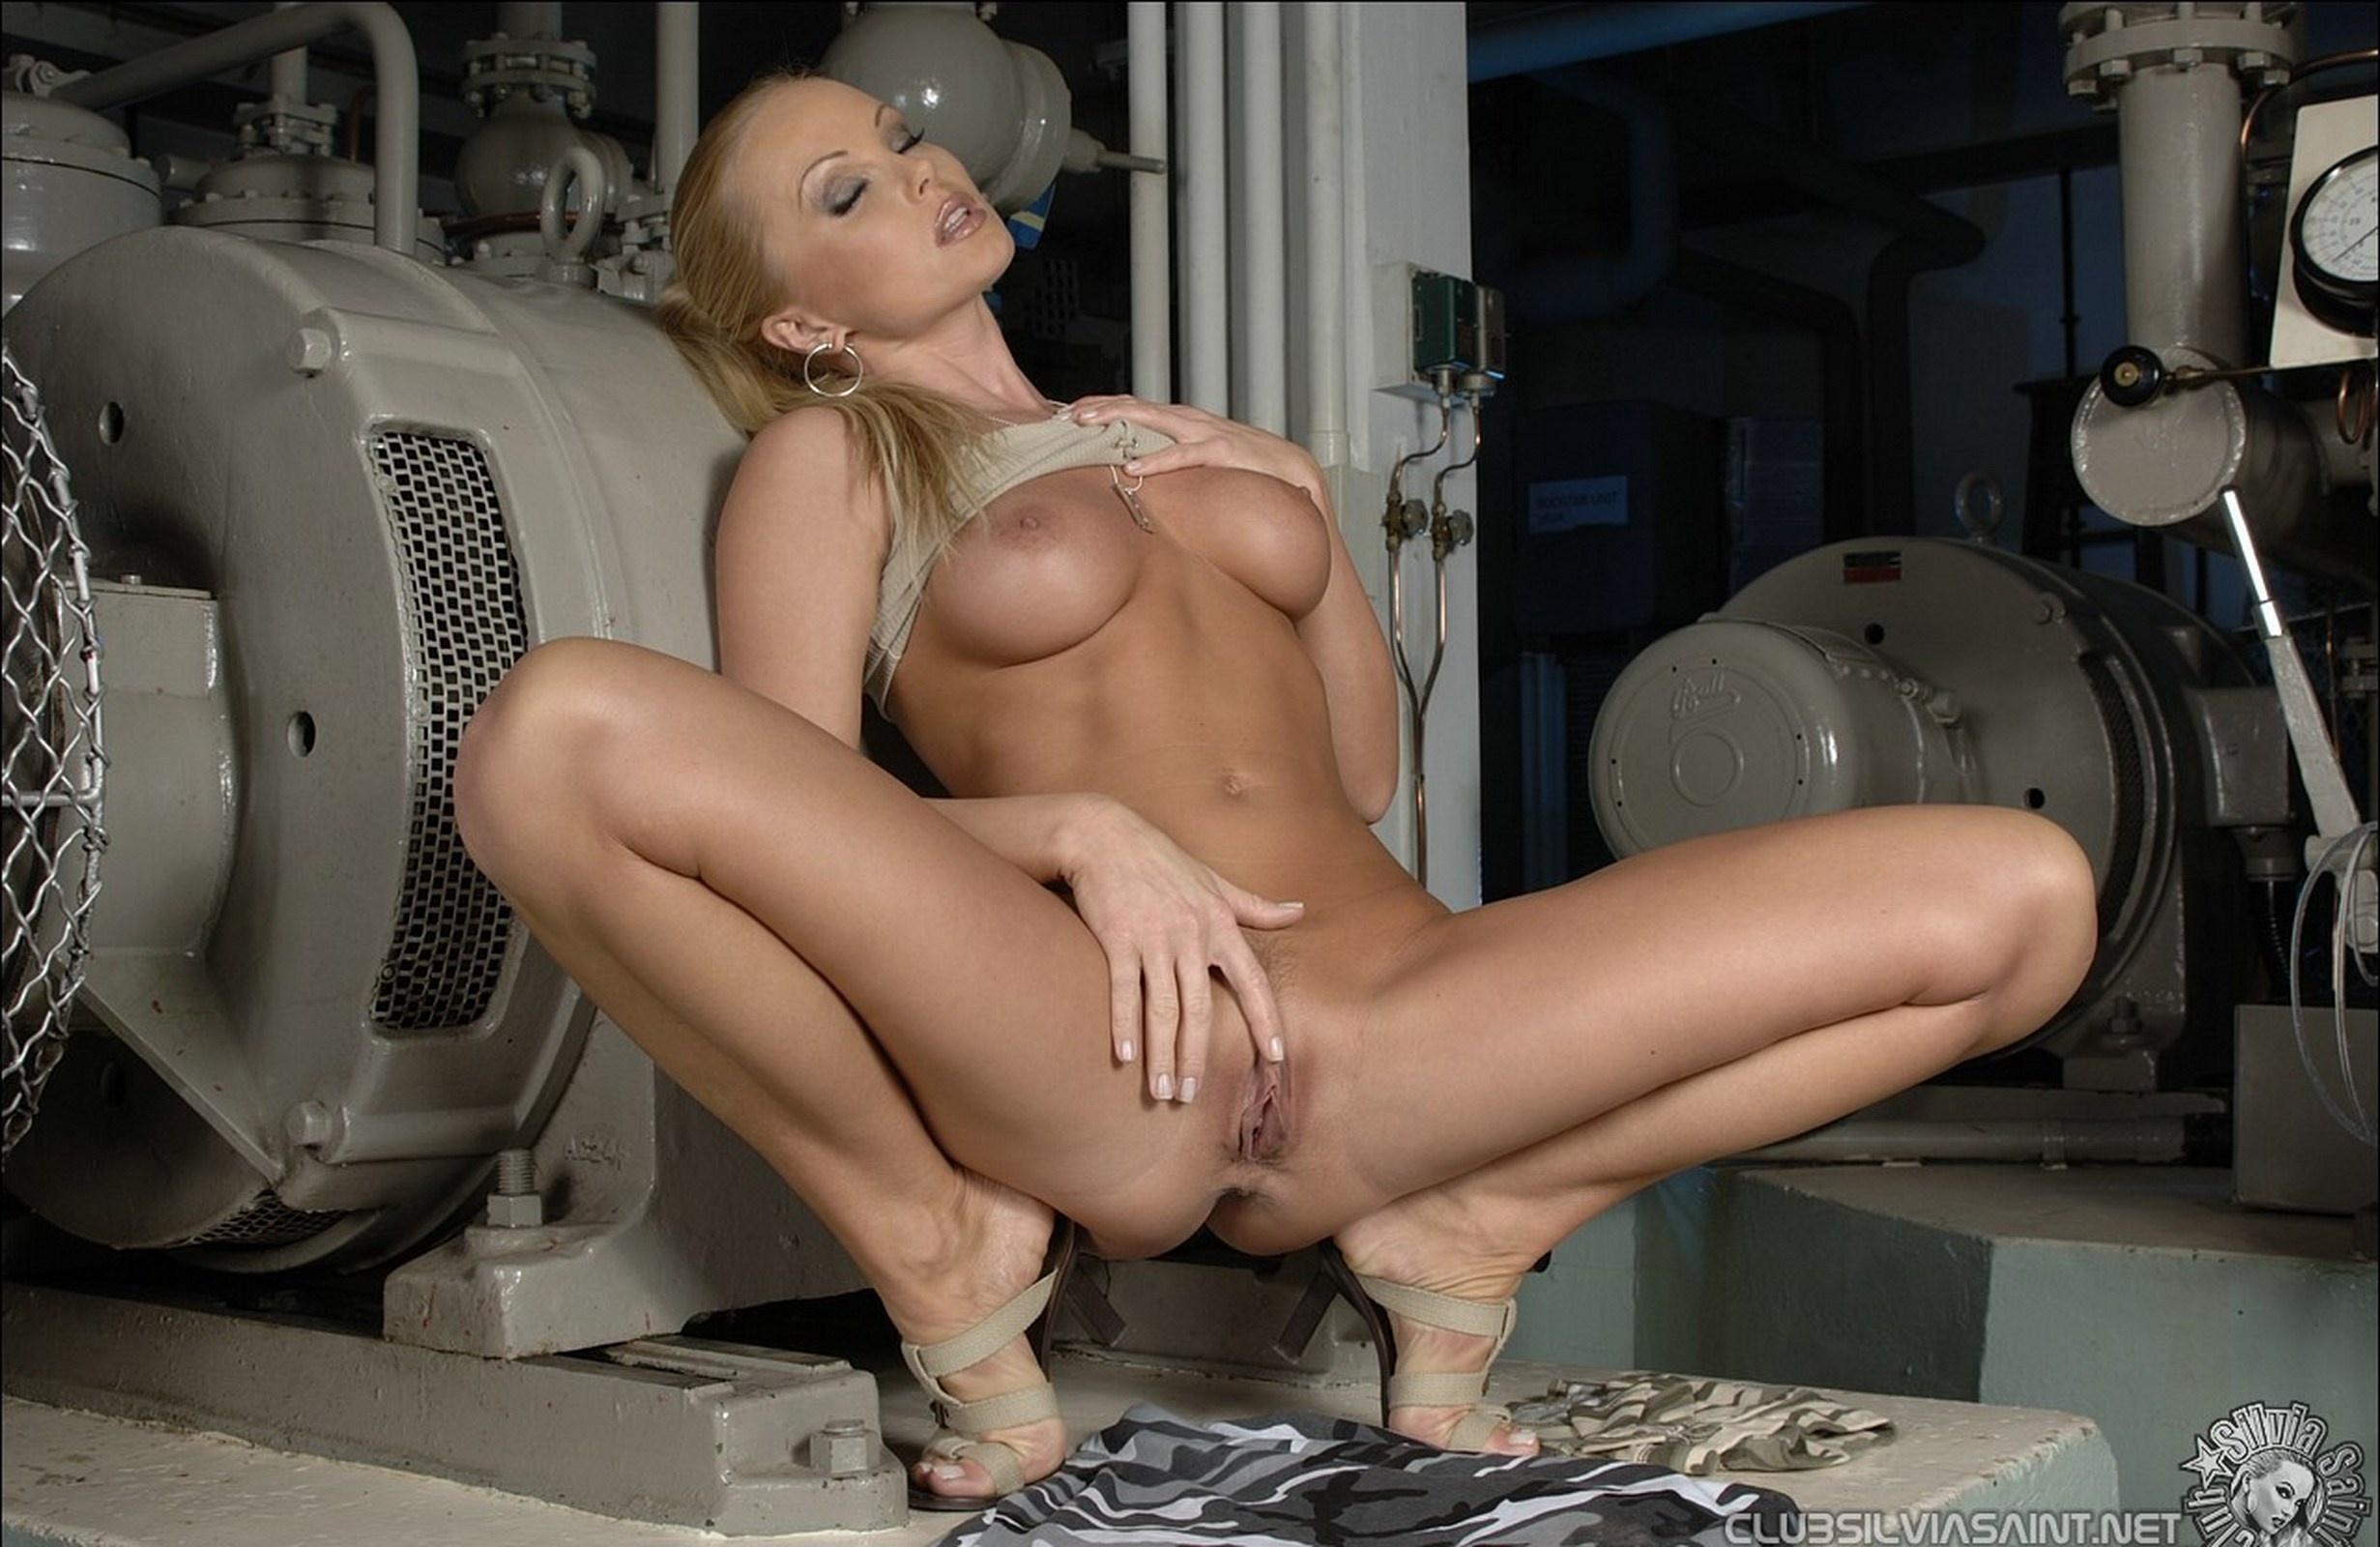 Святая сильвия порно 15 фотография